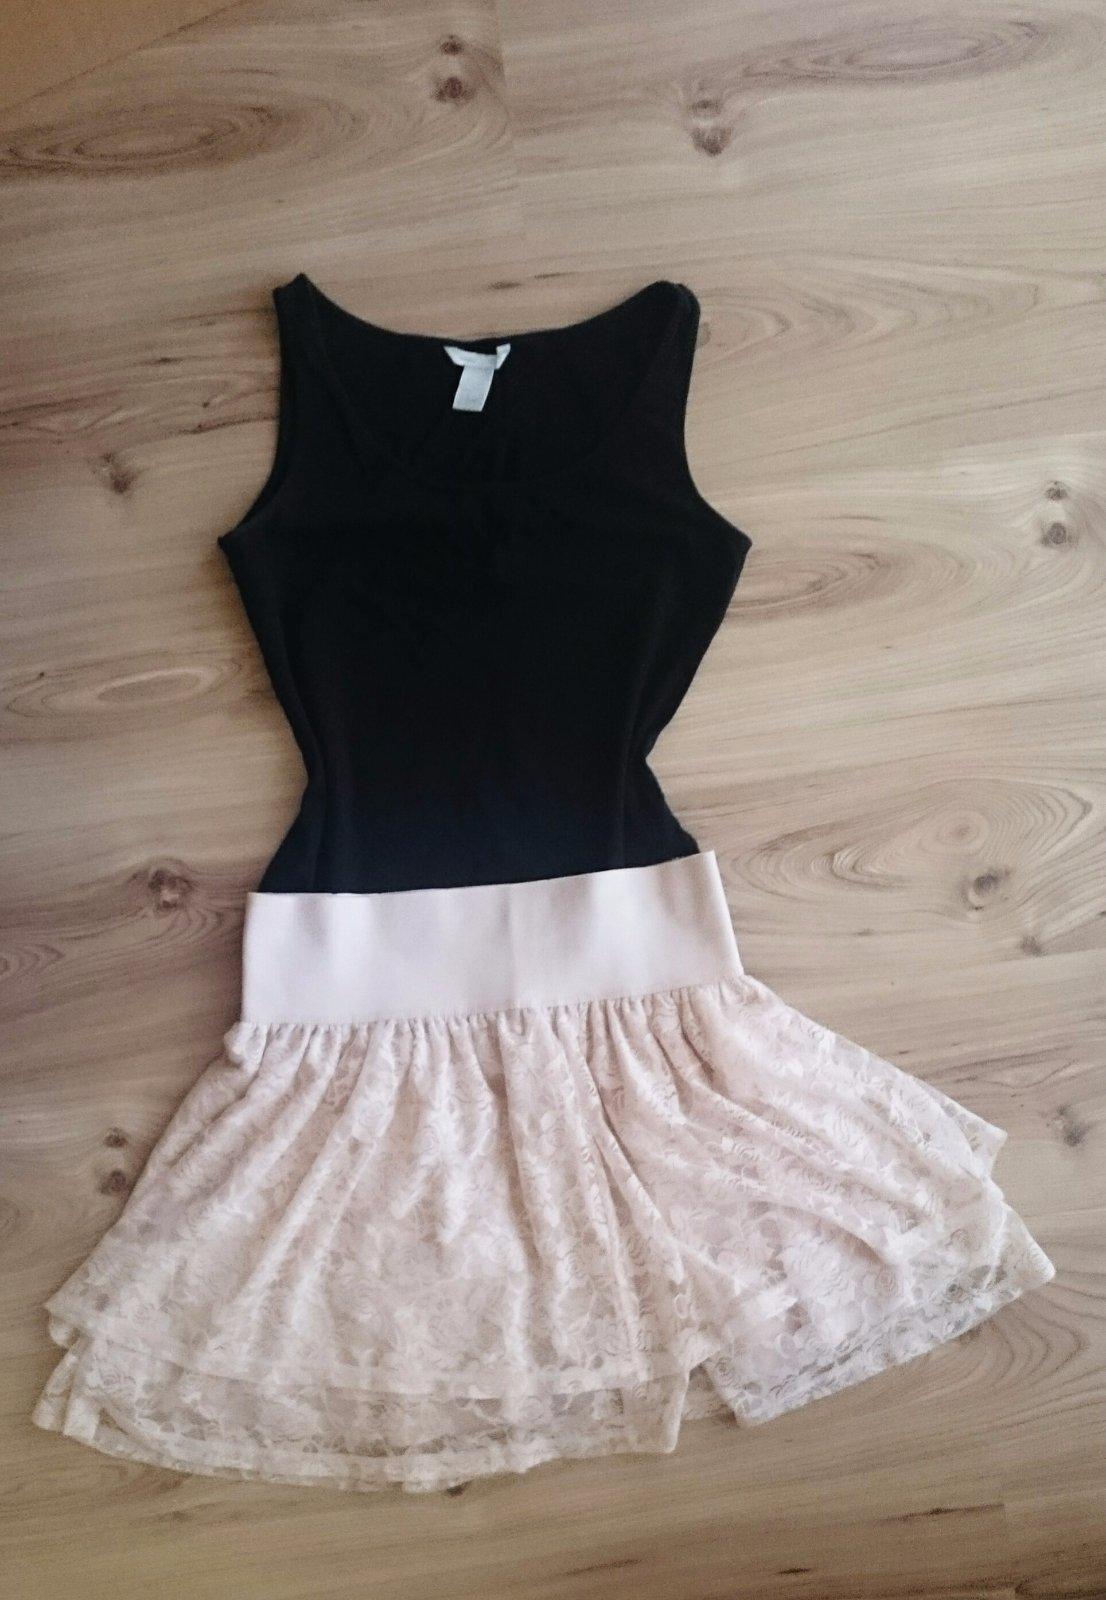 čipkovaná sukňa - Obrázok č. 4